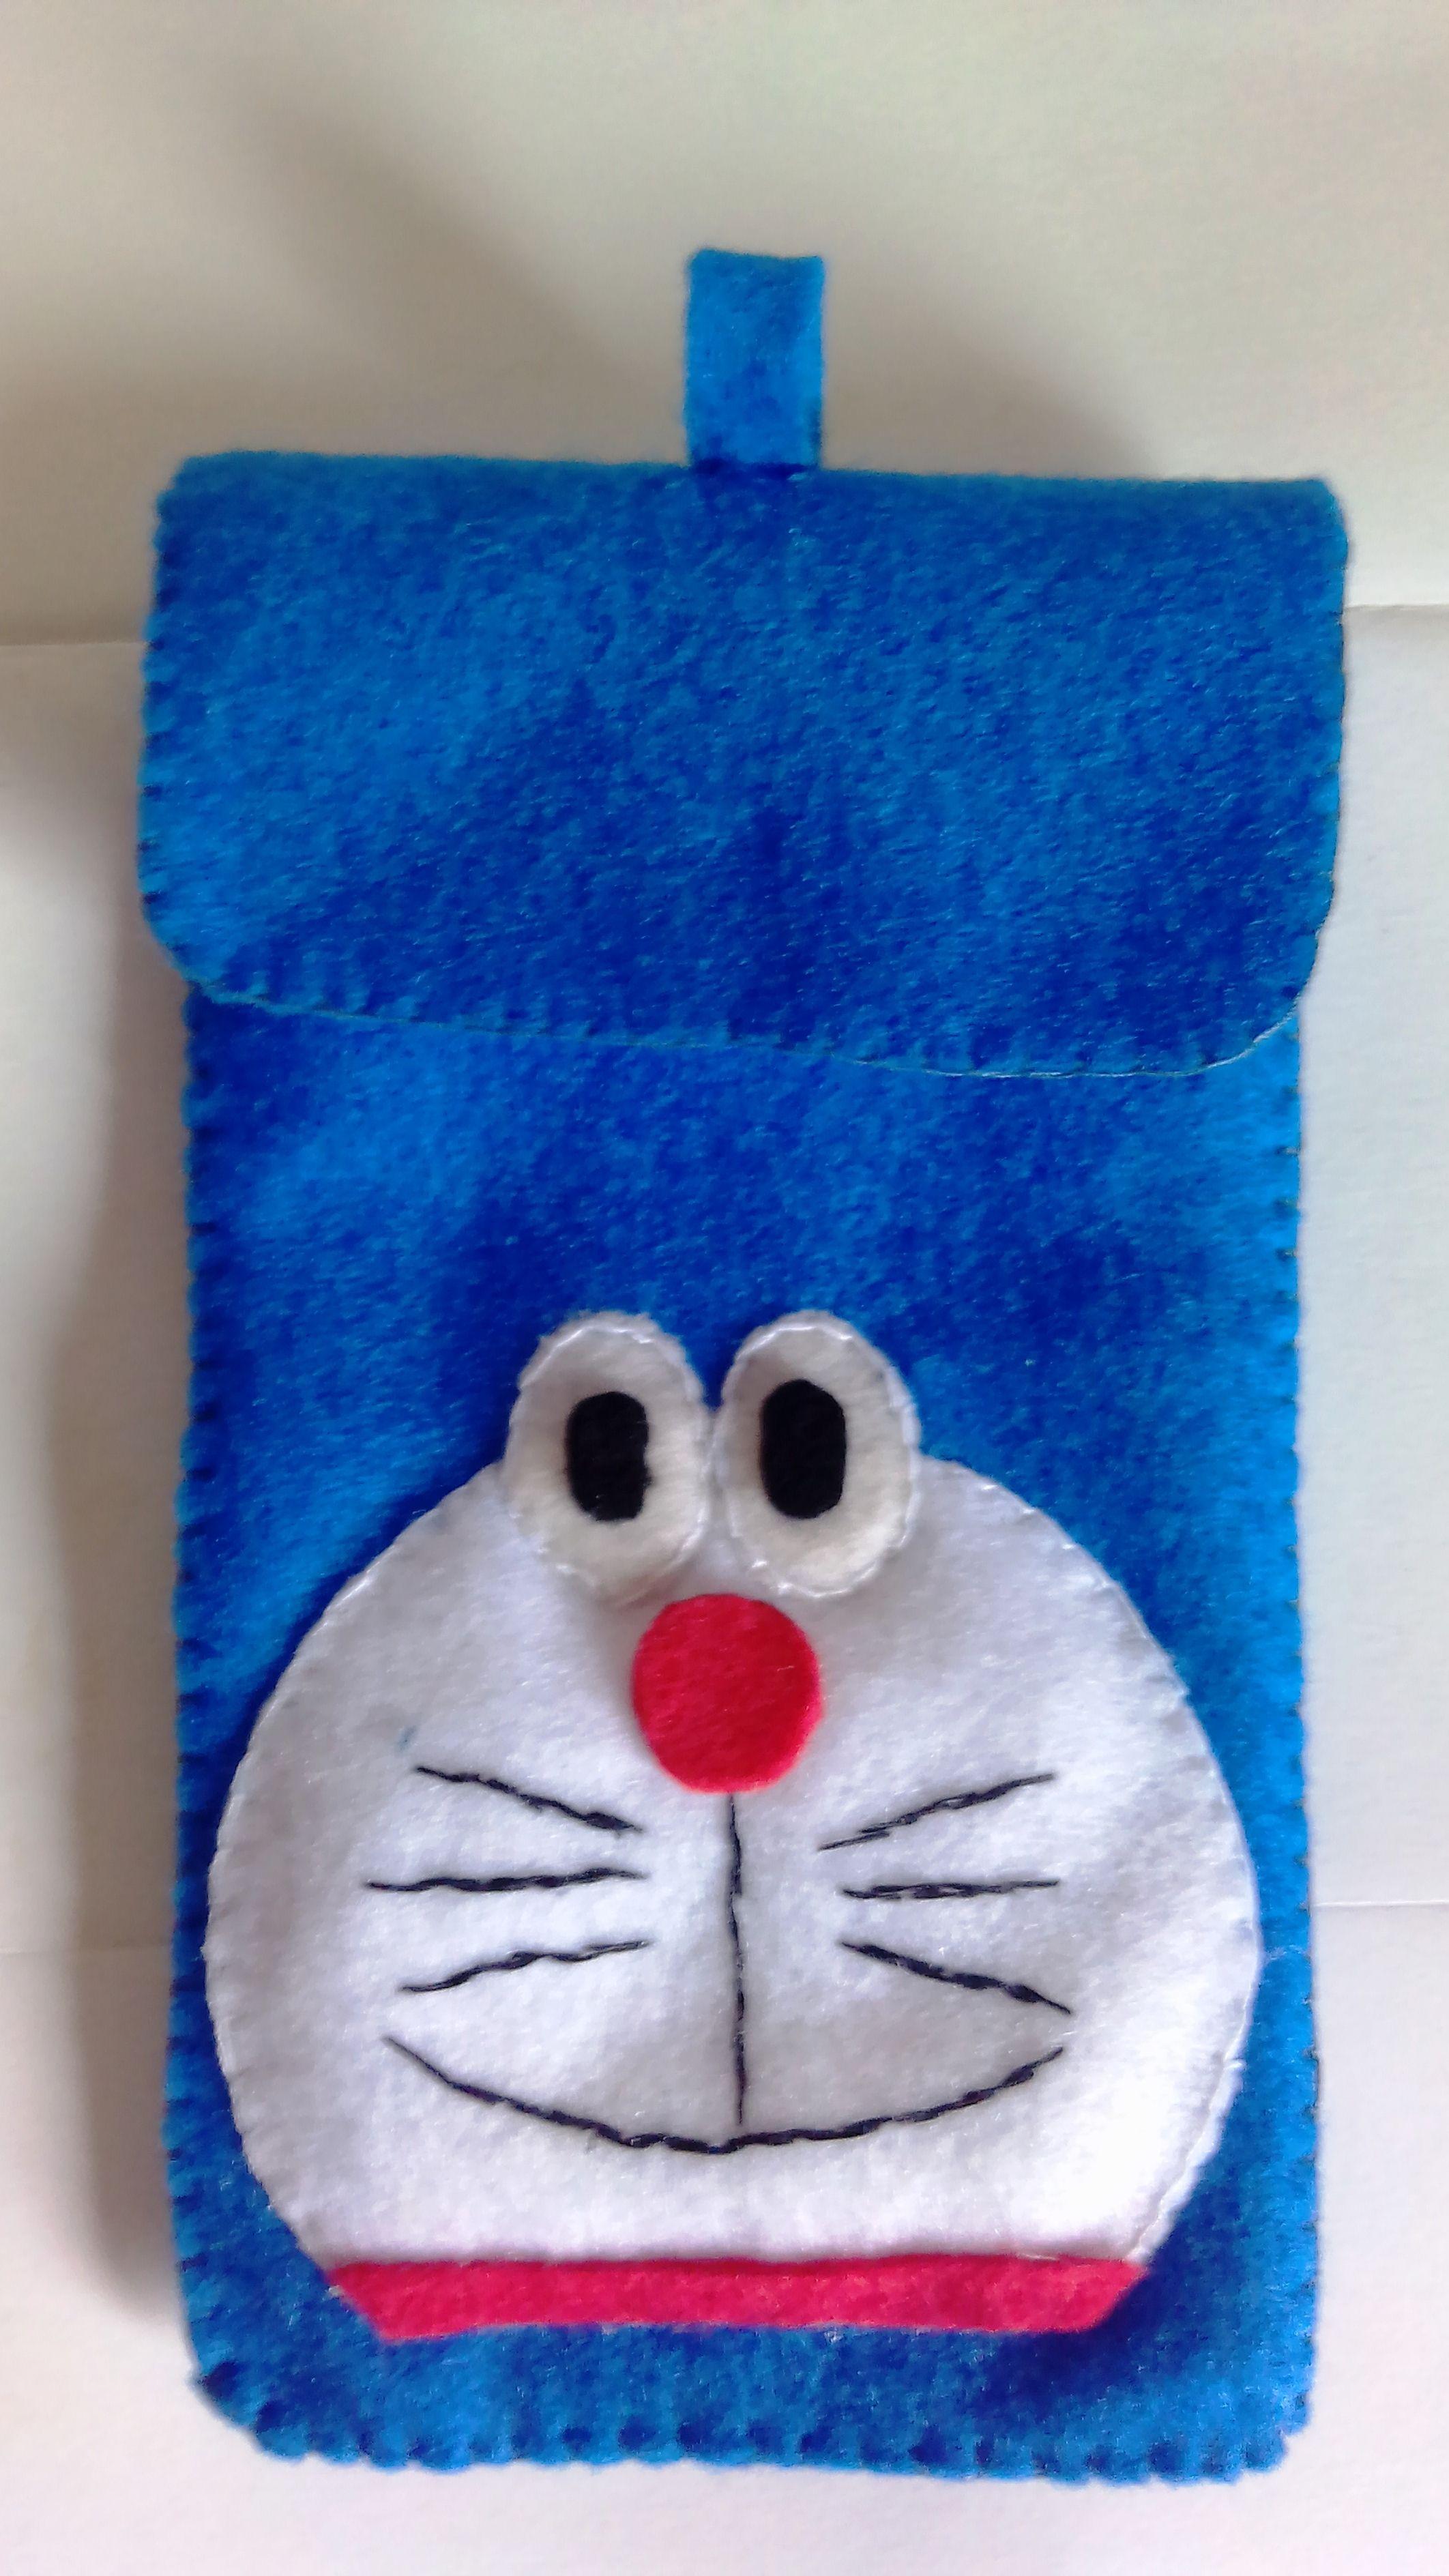 Softcase sarung Handphone motif doraemon dari kain Flanel